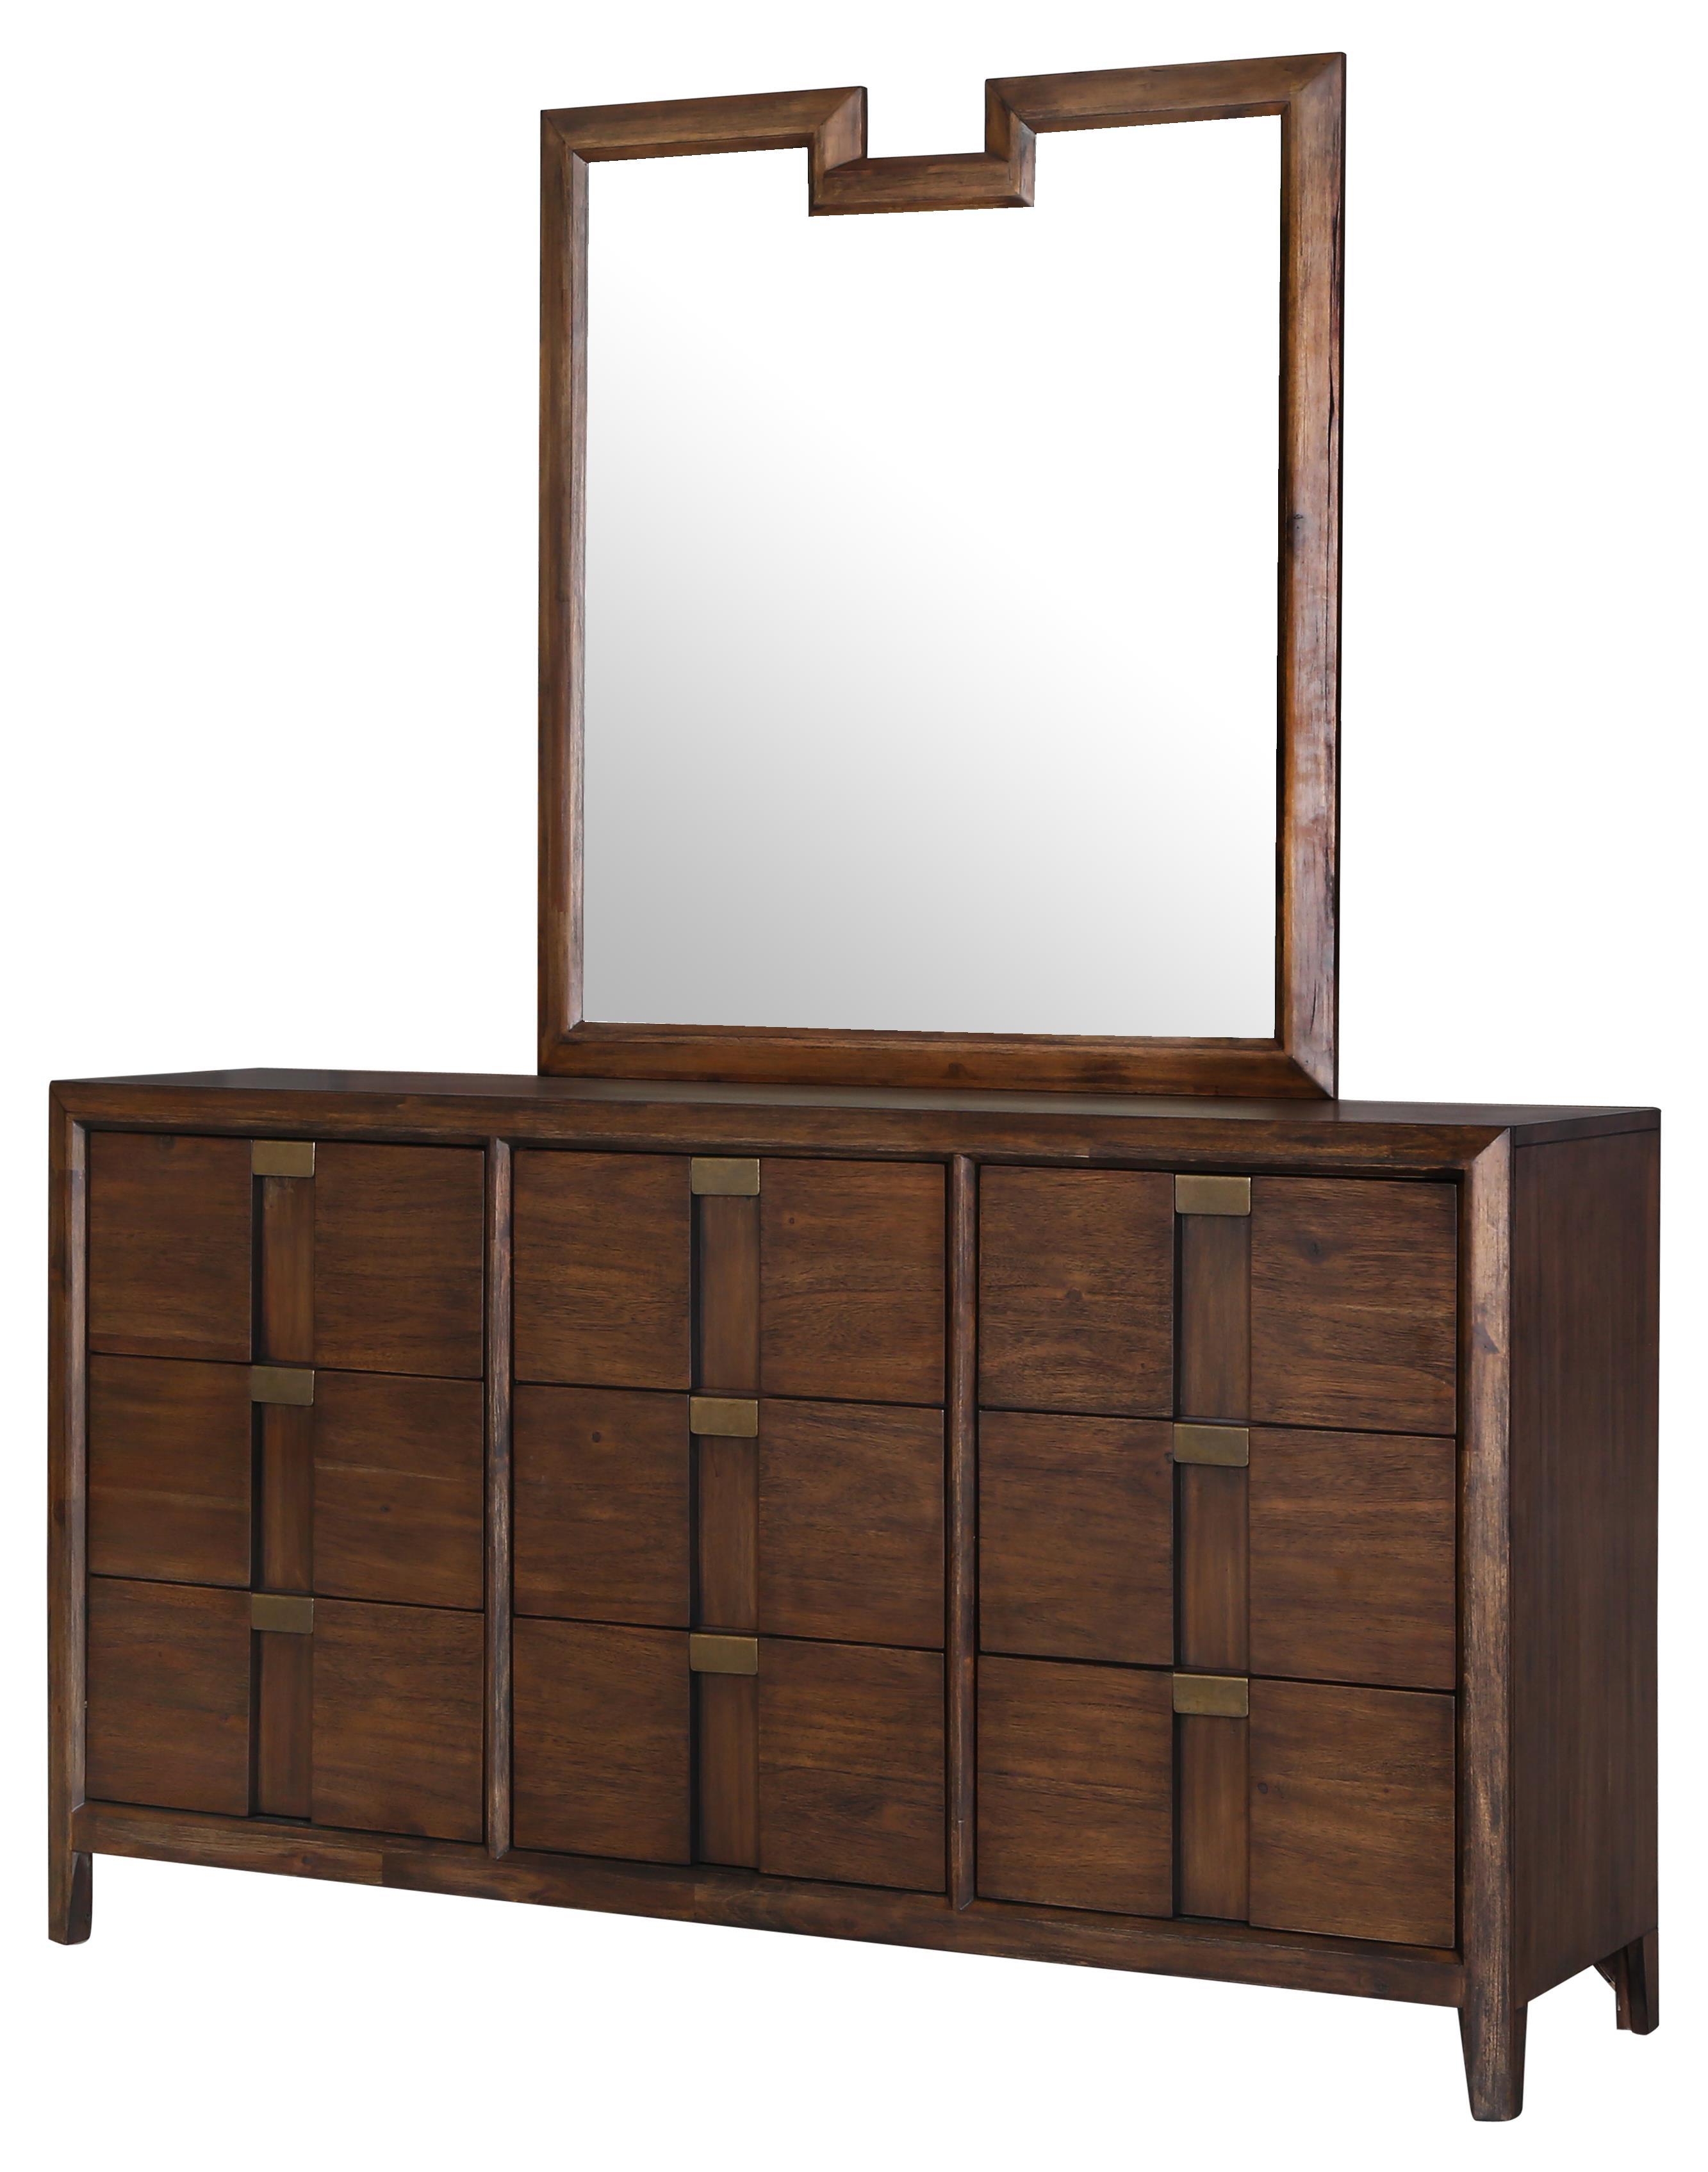 Belfort Select Echo Dresser and Mirror - Item Number: B3267-42+20